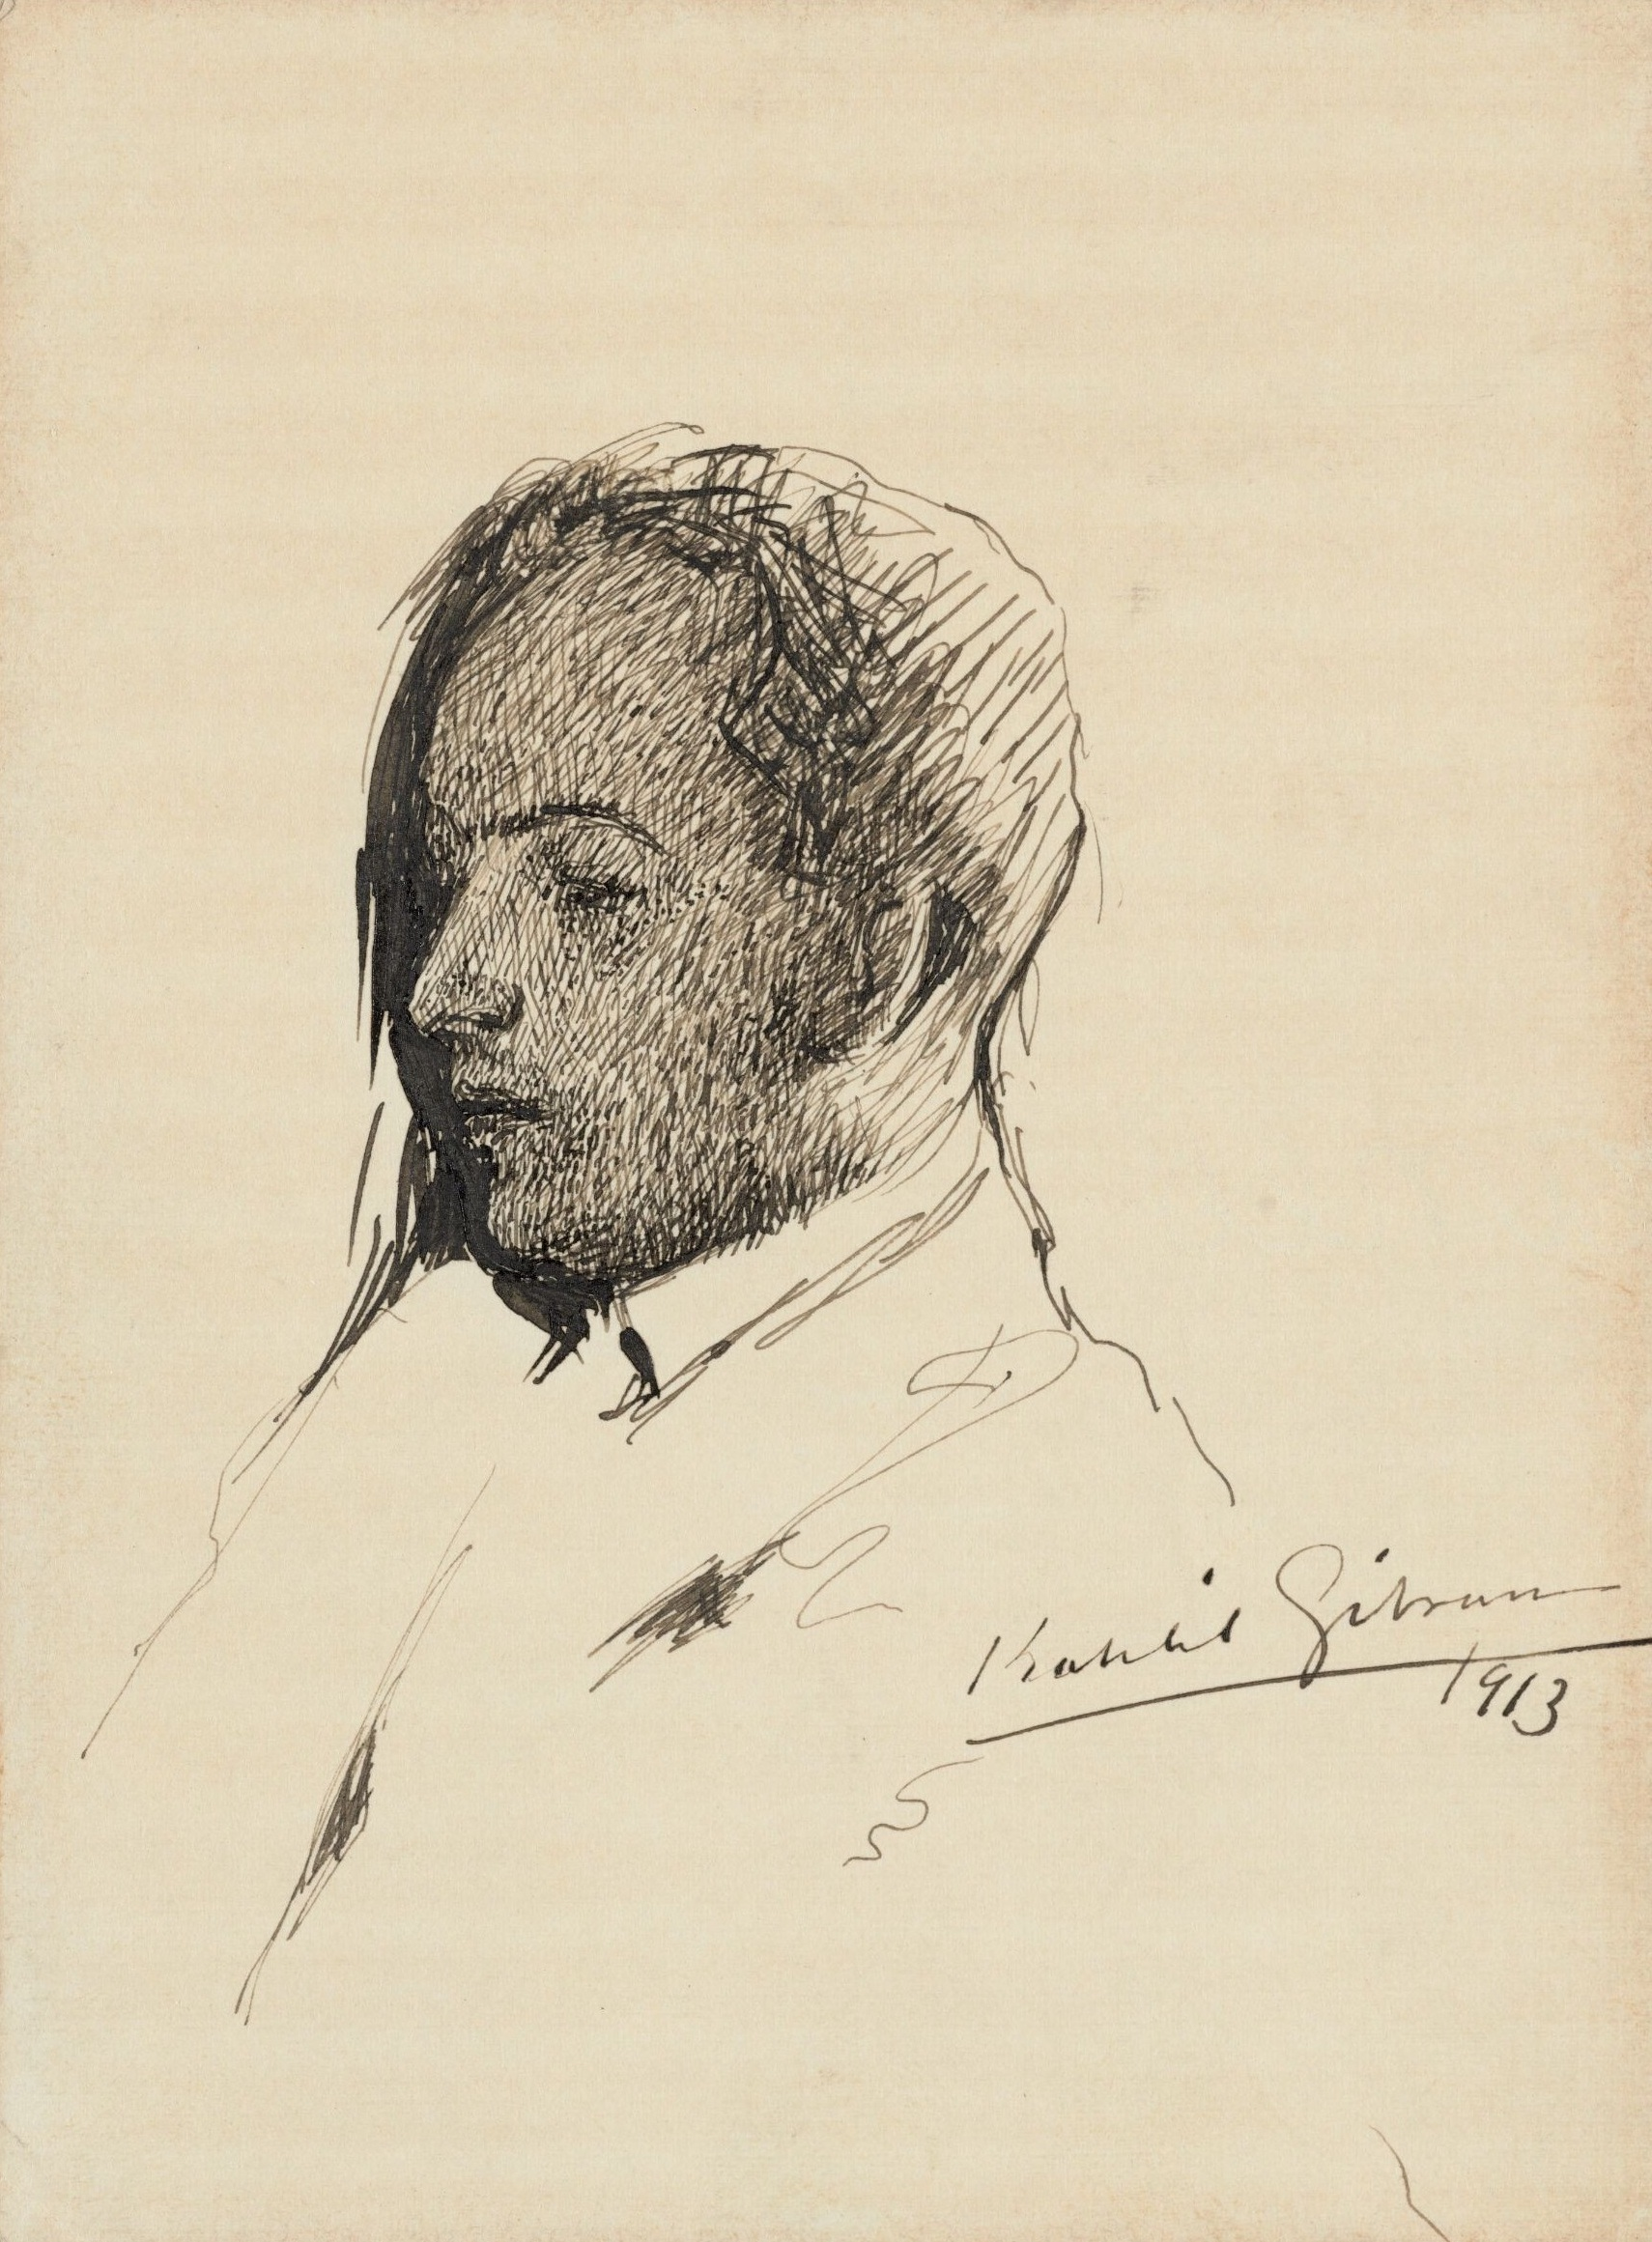 Letters of Kahlil Gibran to Witter Bynner